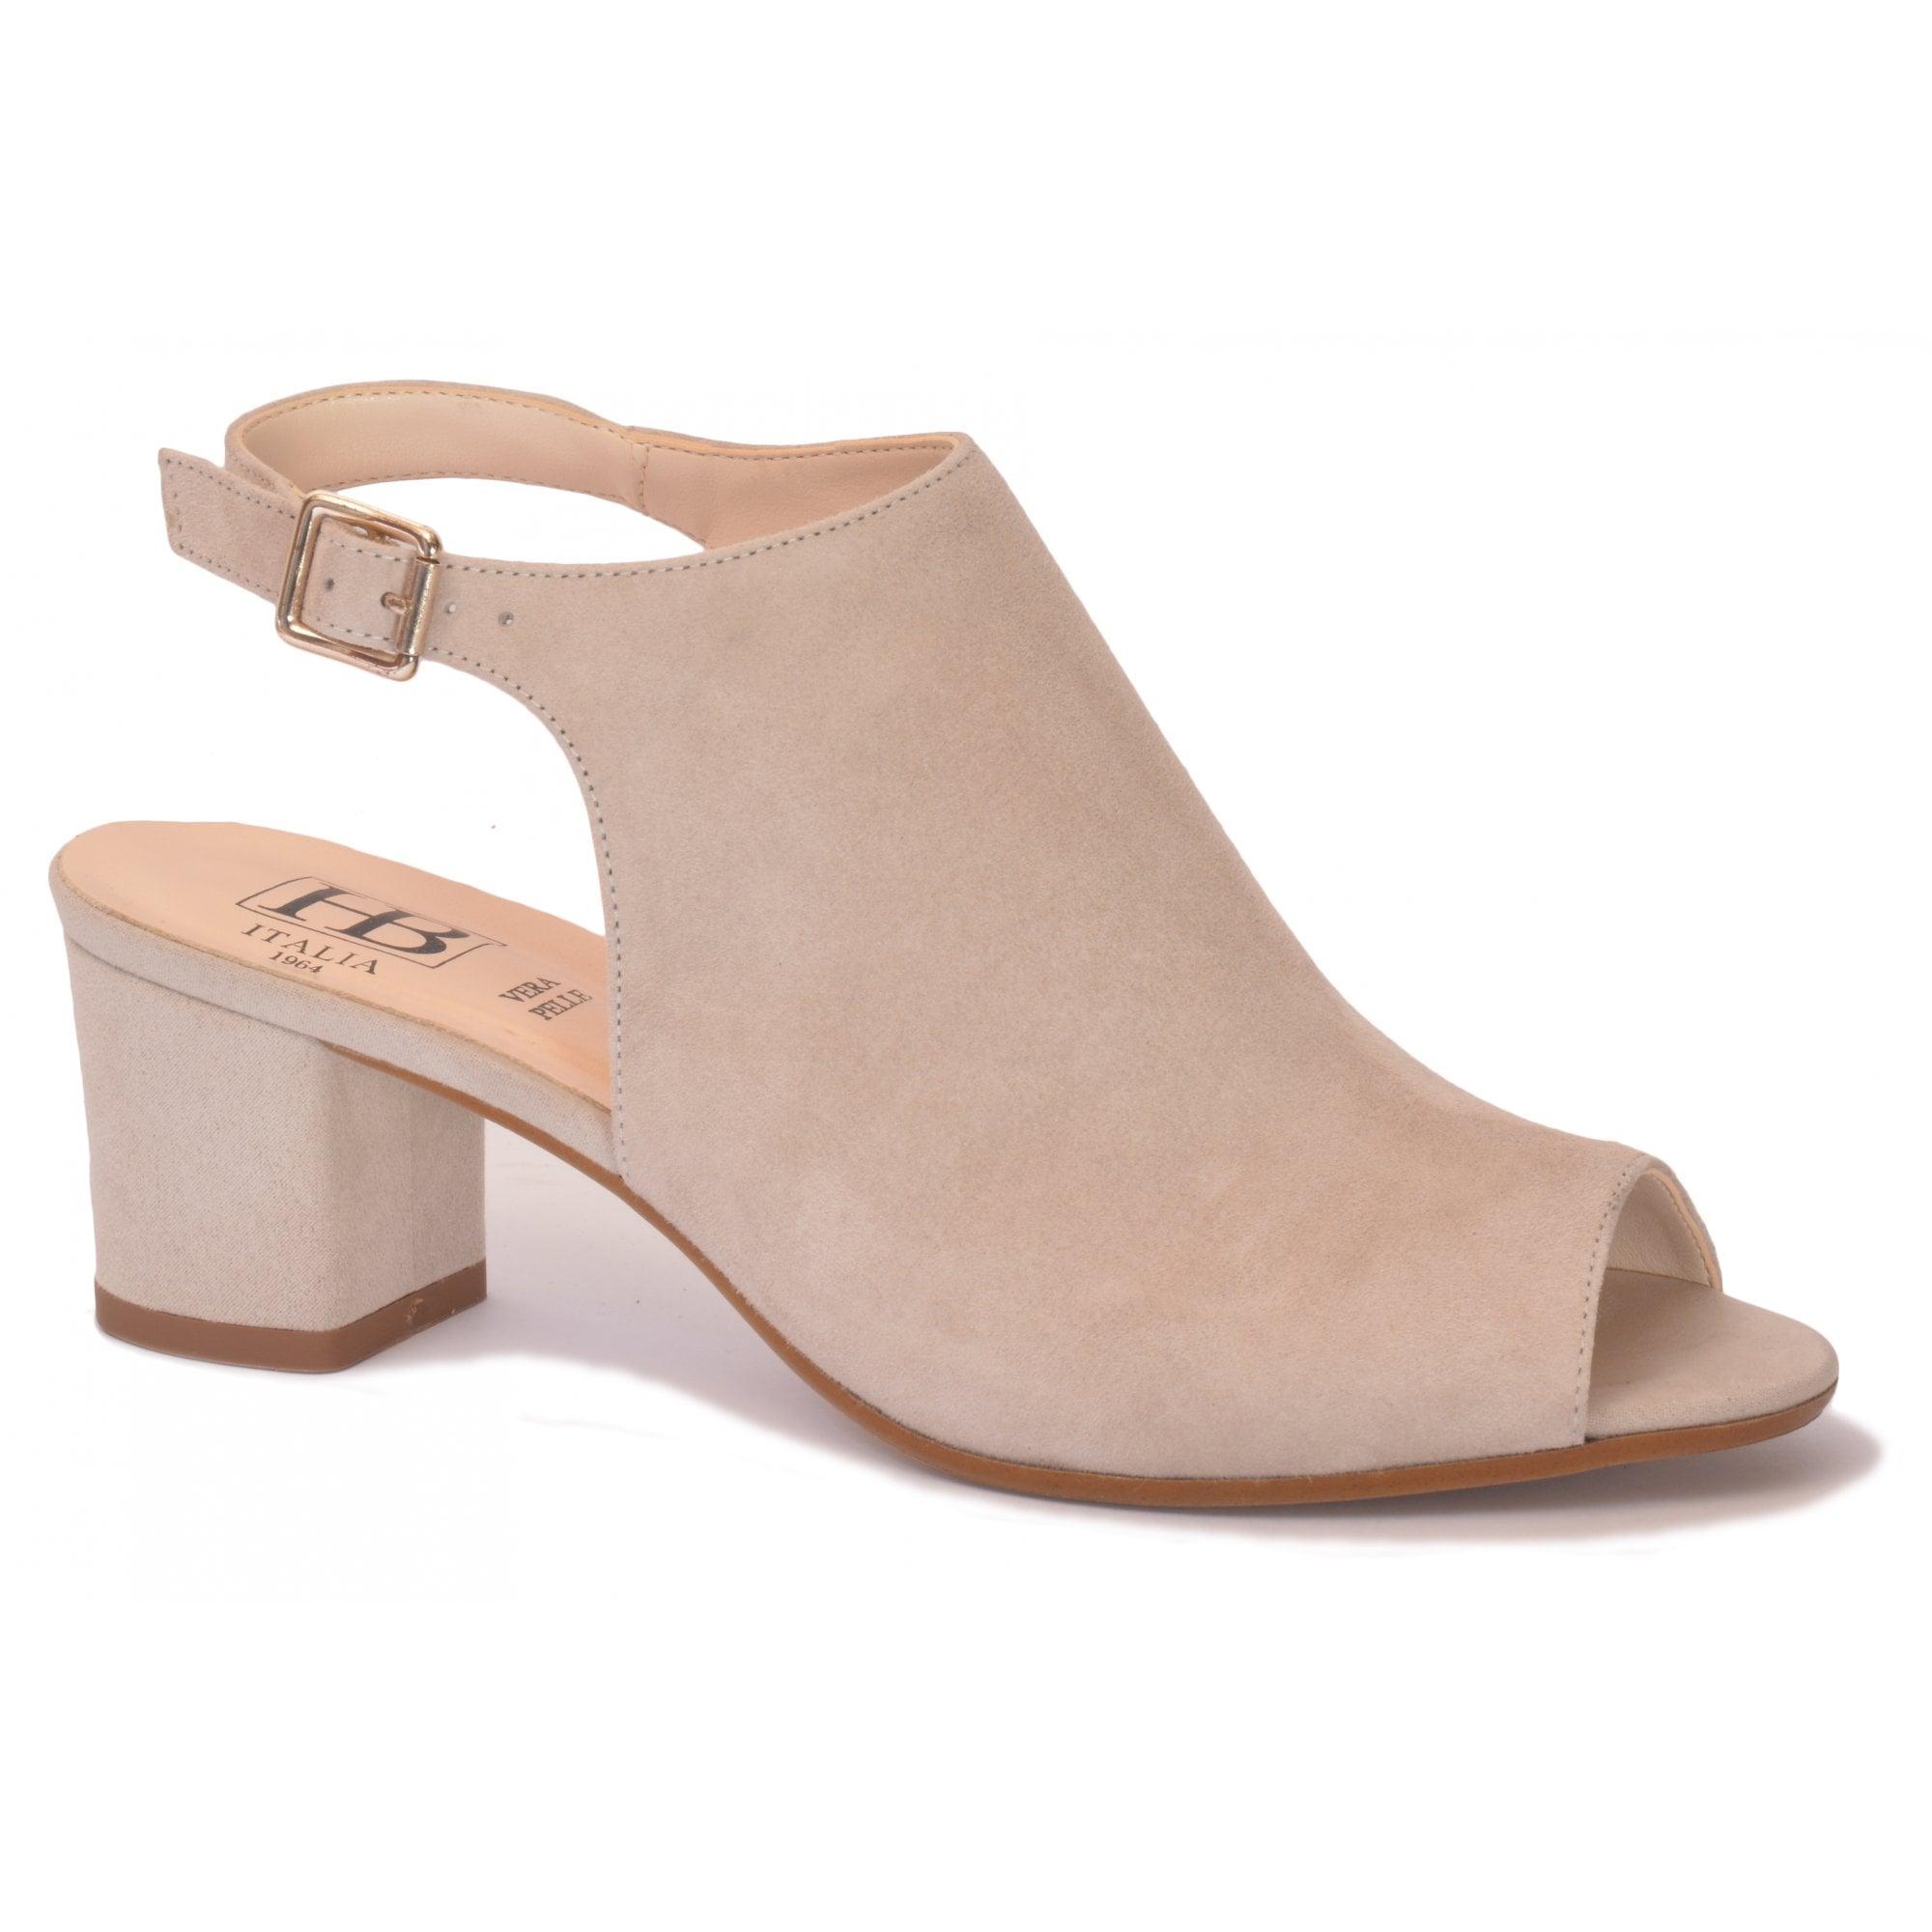 HB Shoes Shannon B692 Beige Suede